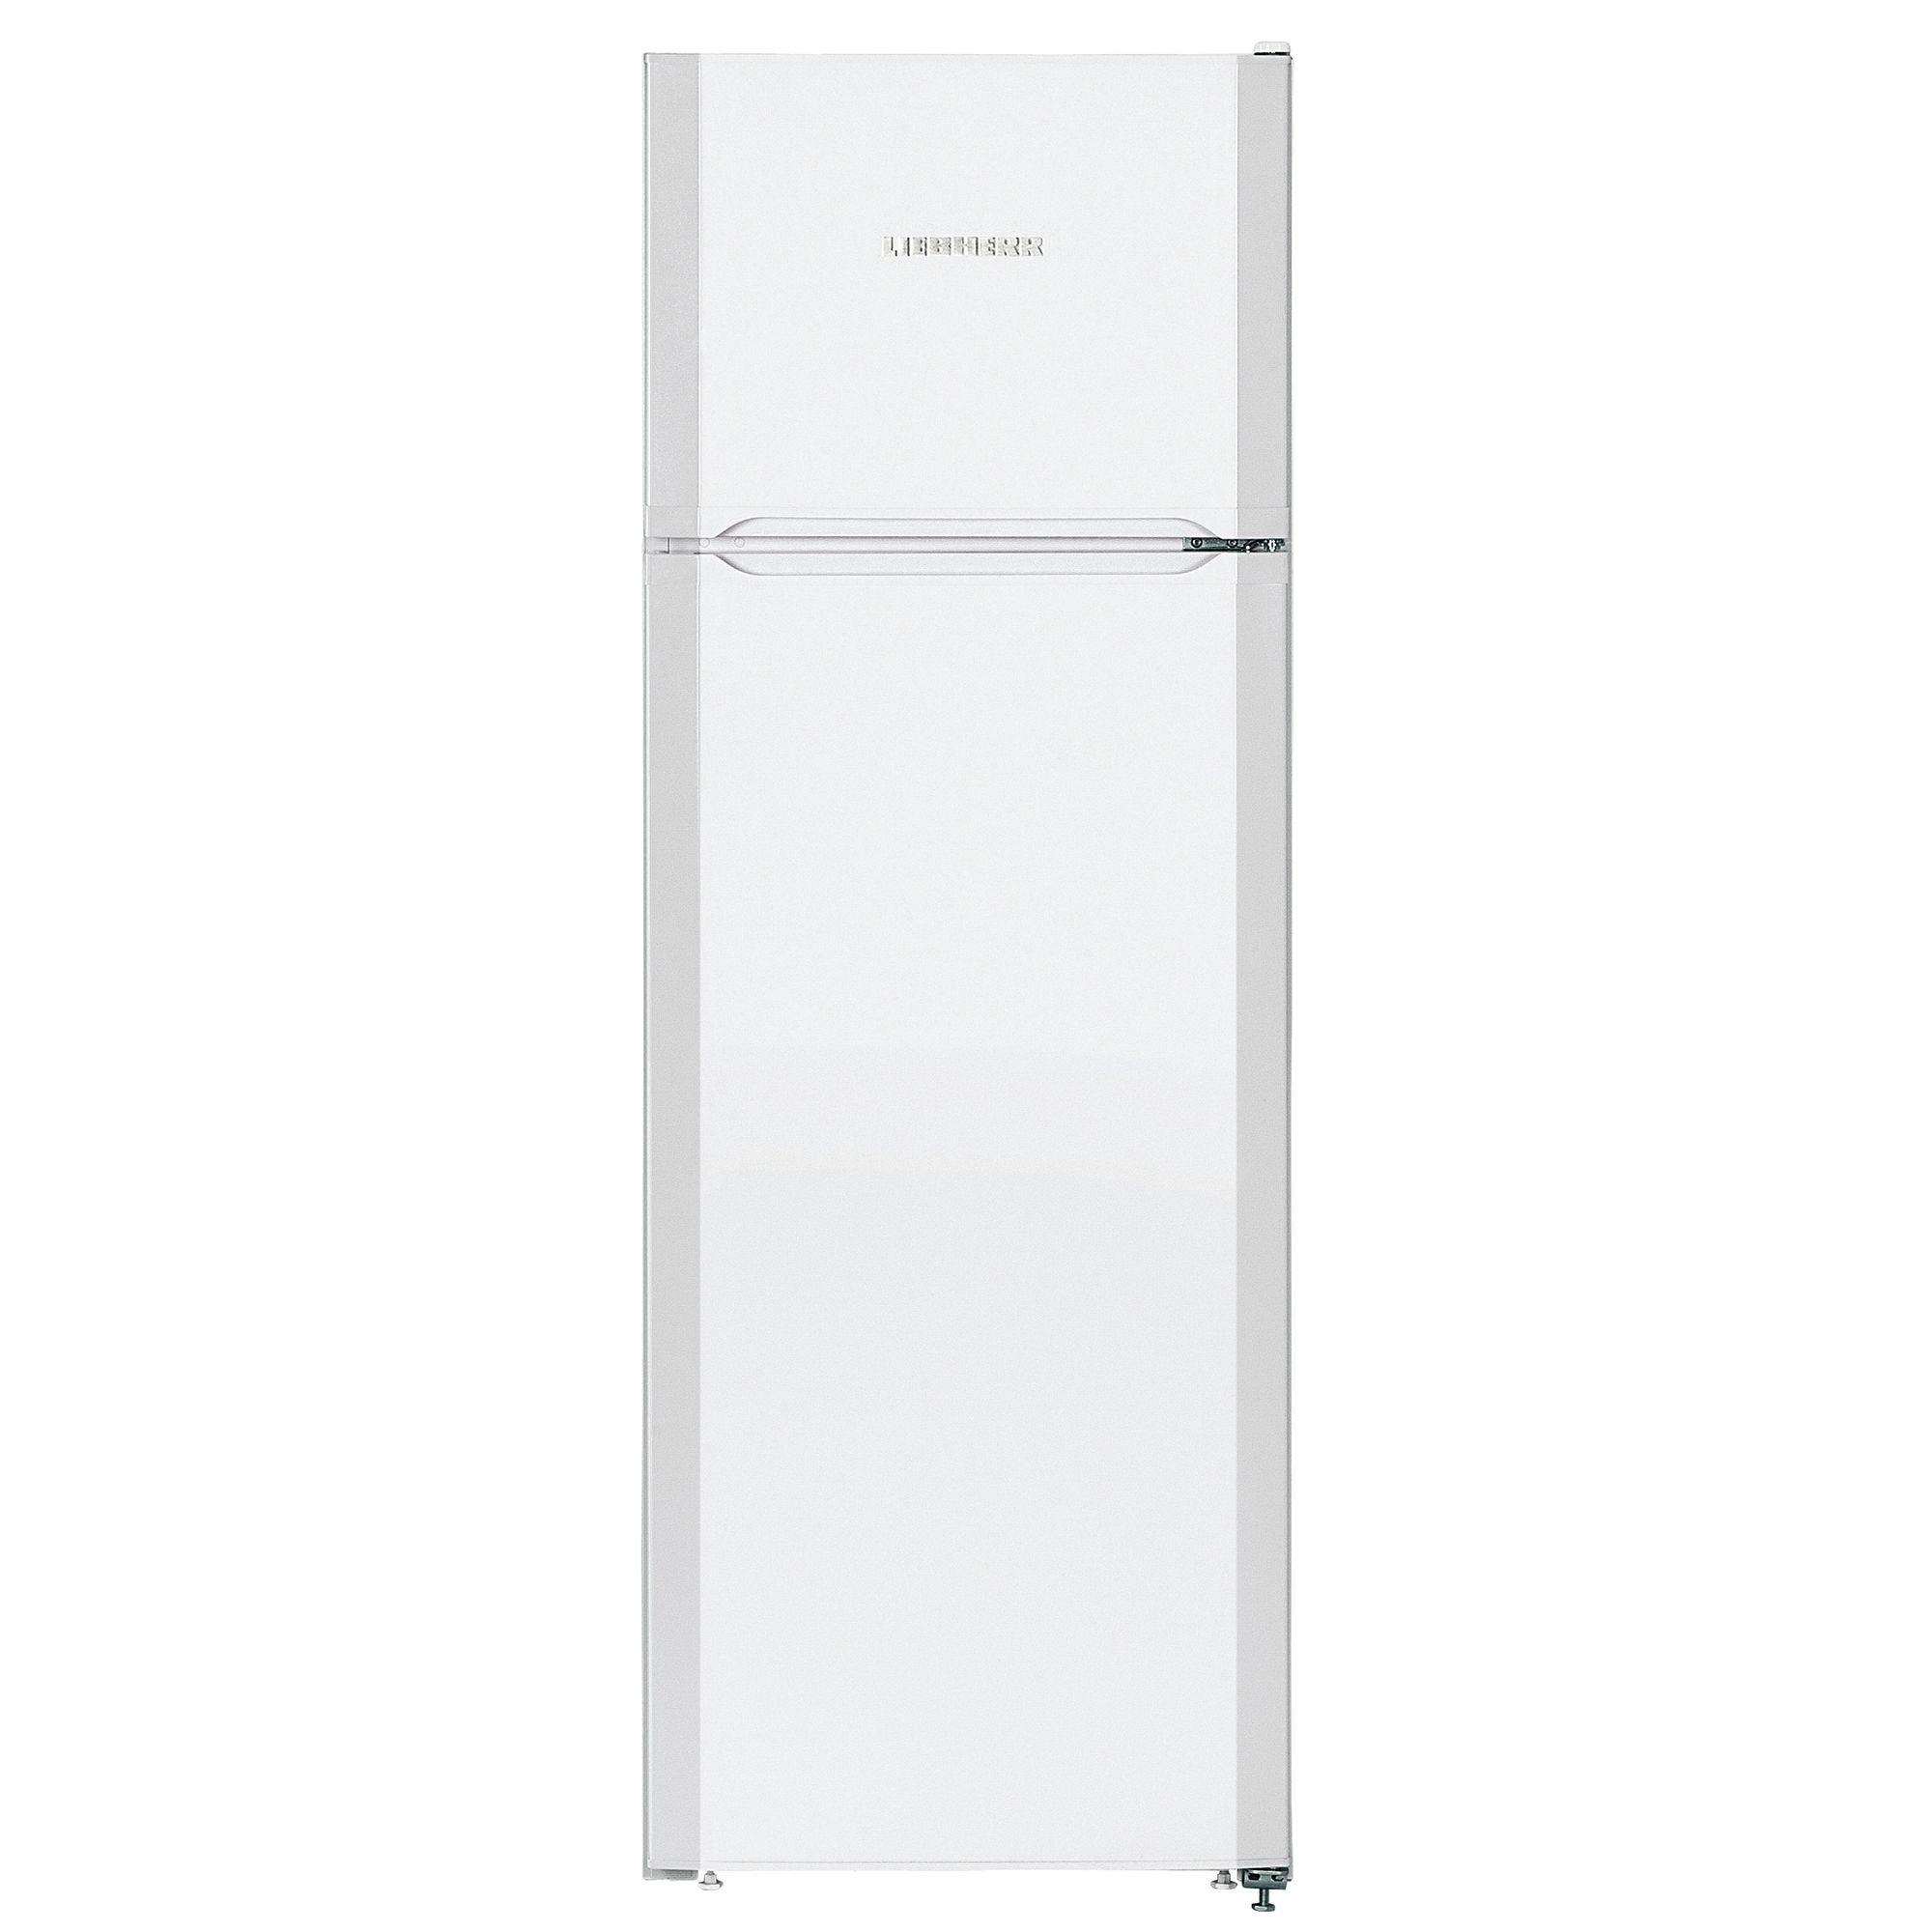 Хладилник Liebherr CTP2921, 272 л, Клас A++, H 157.1 см, Бял